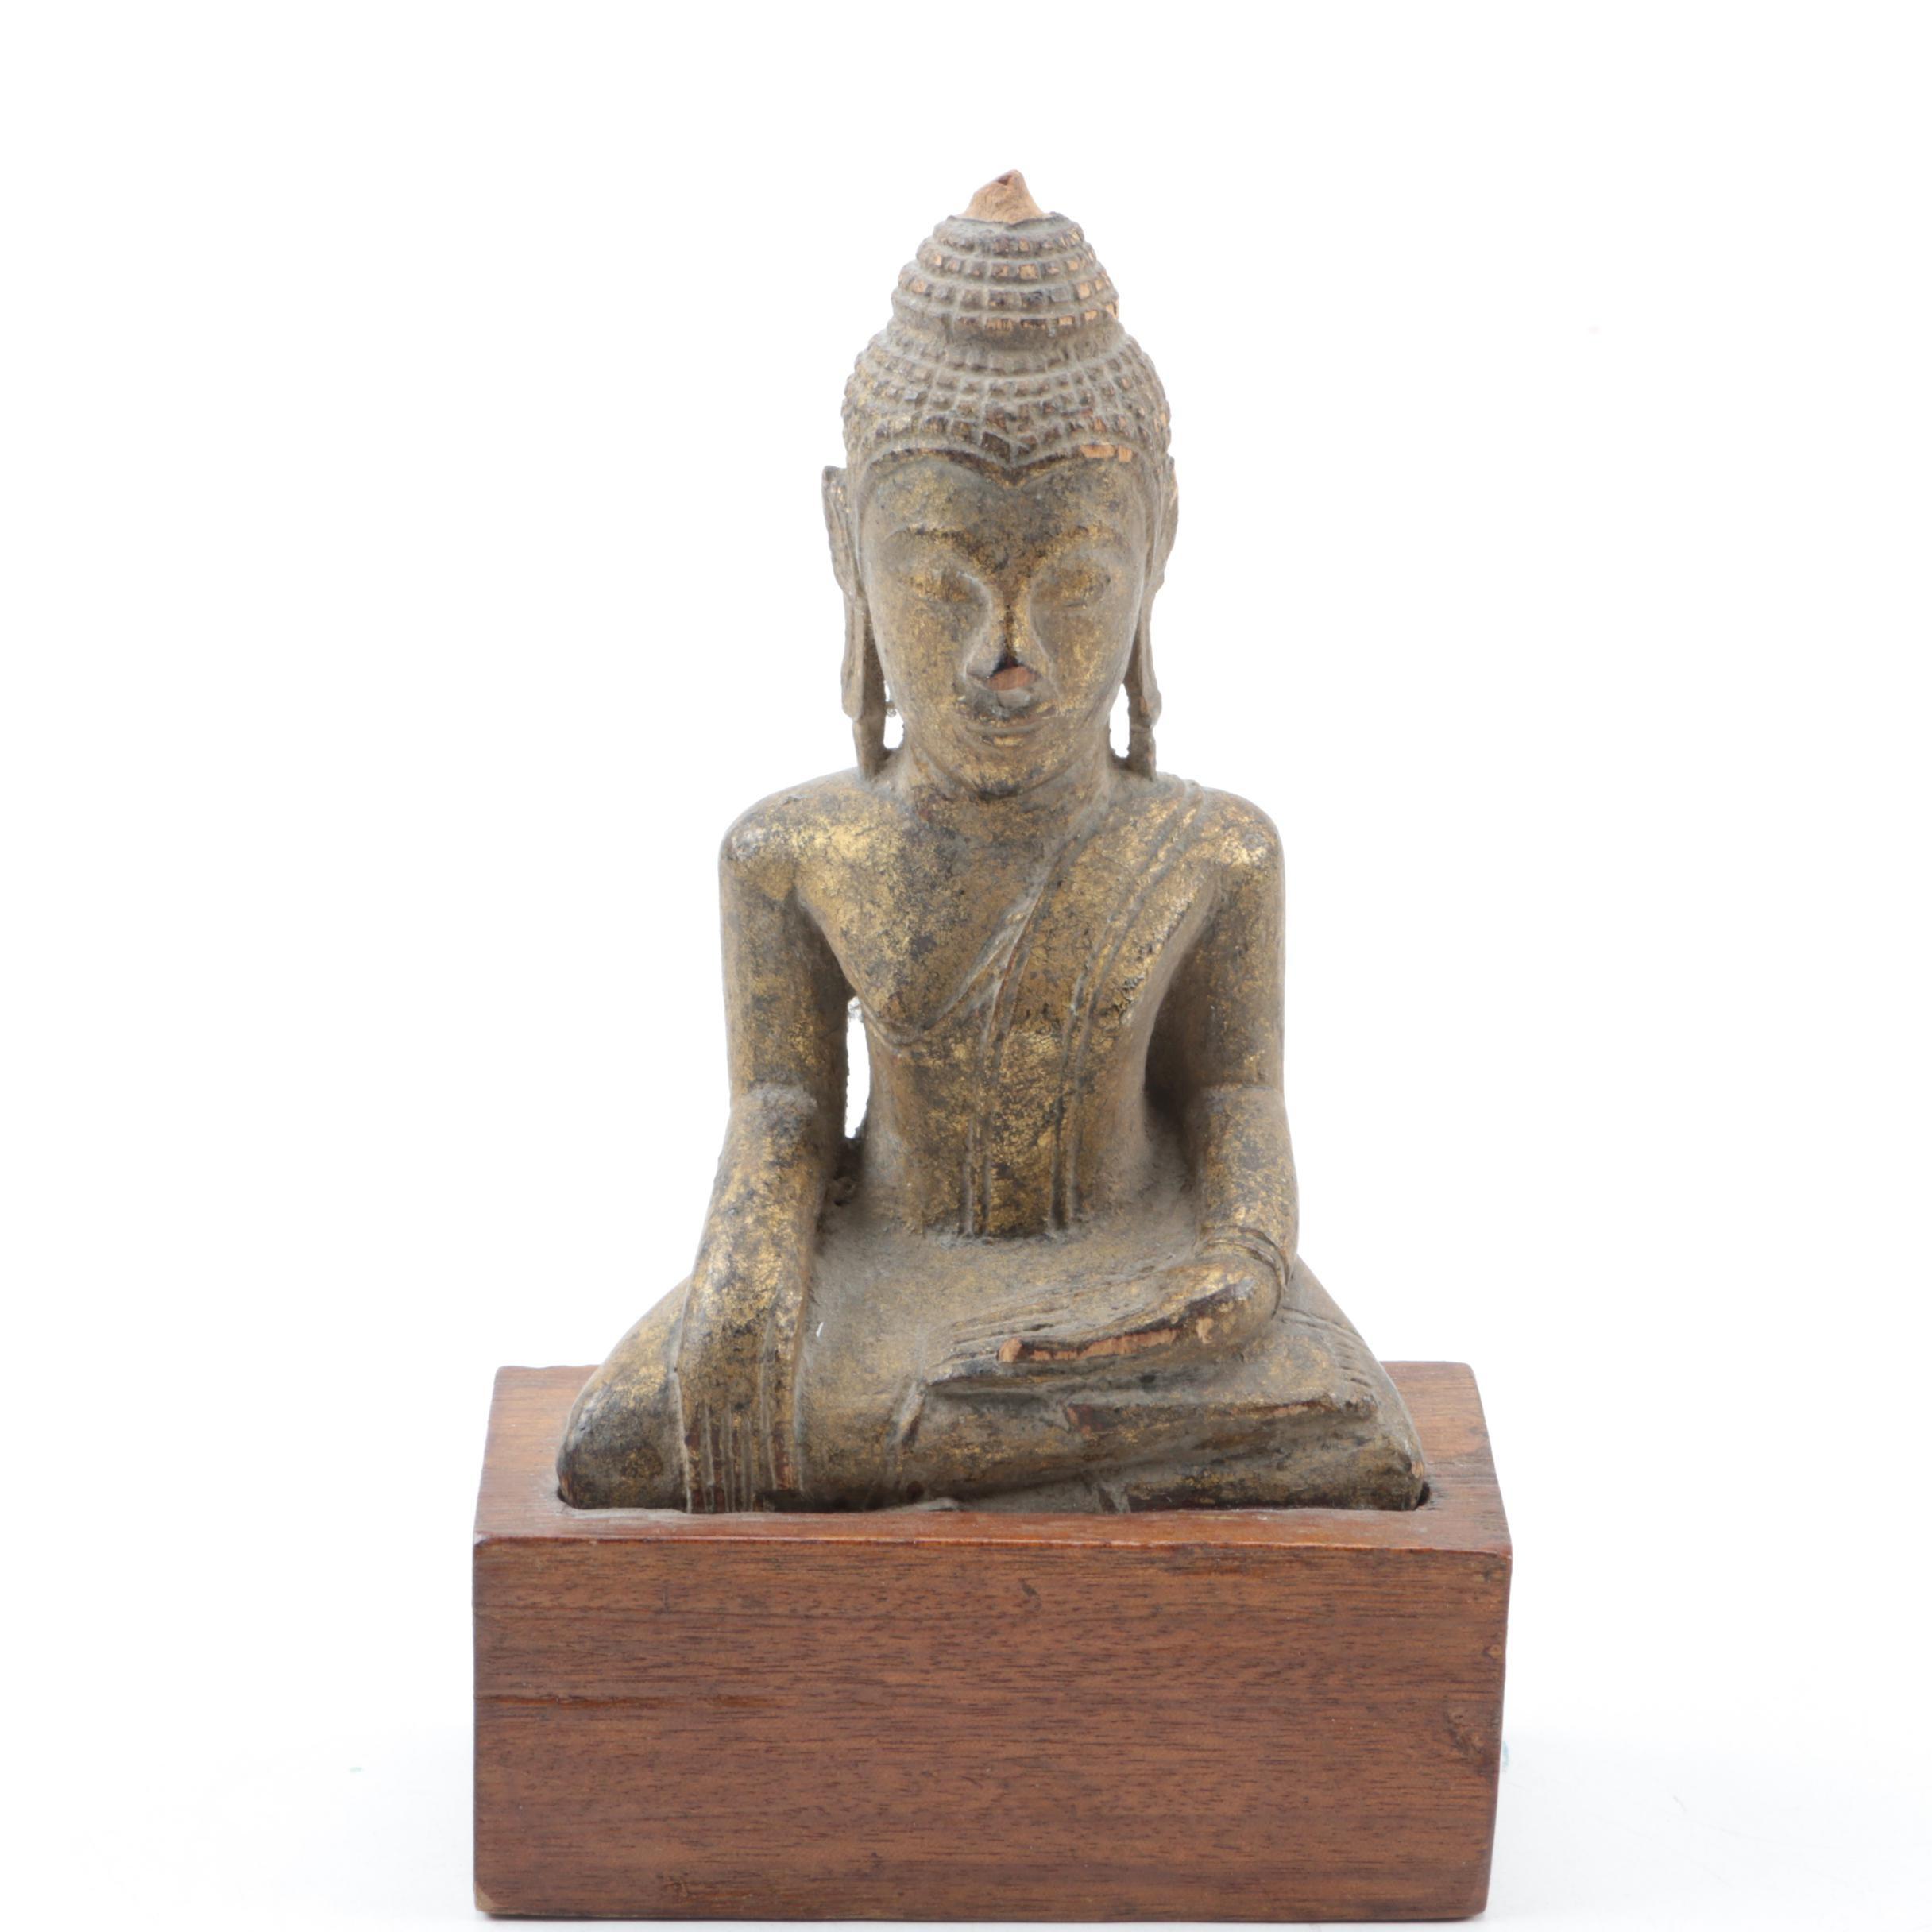 Gilt Gautama Buddha Statue Carved From Wood